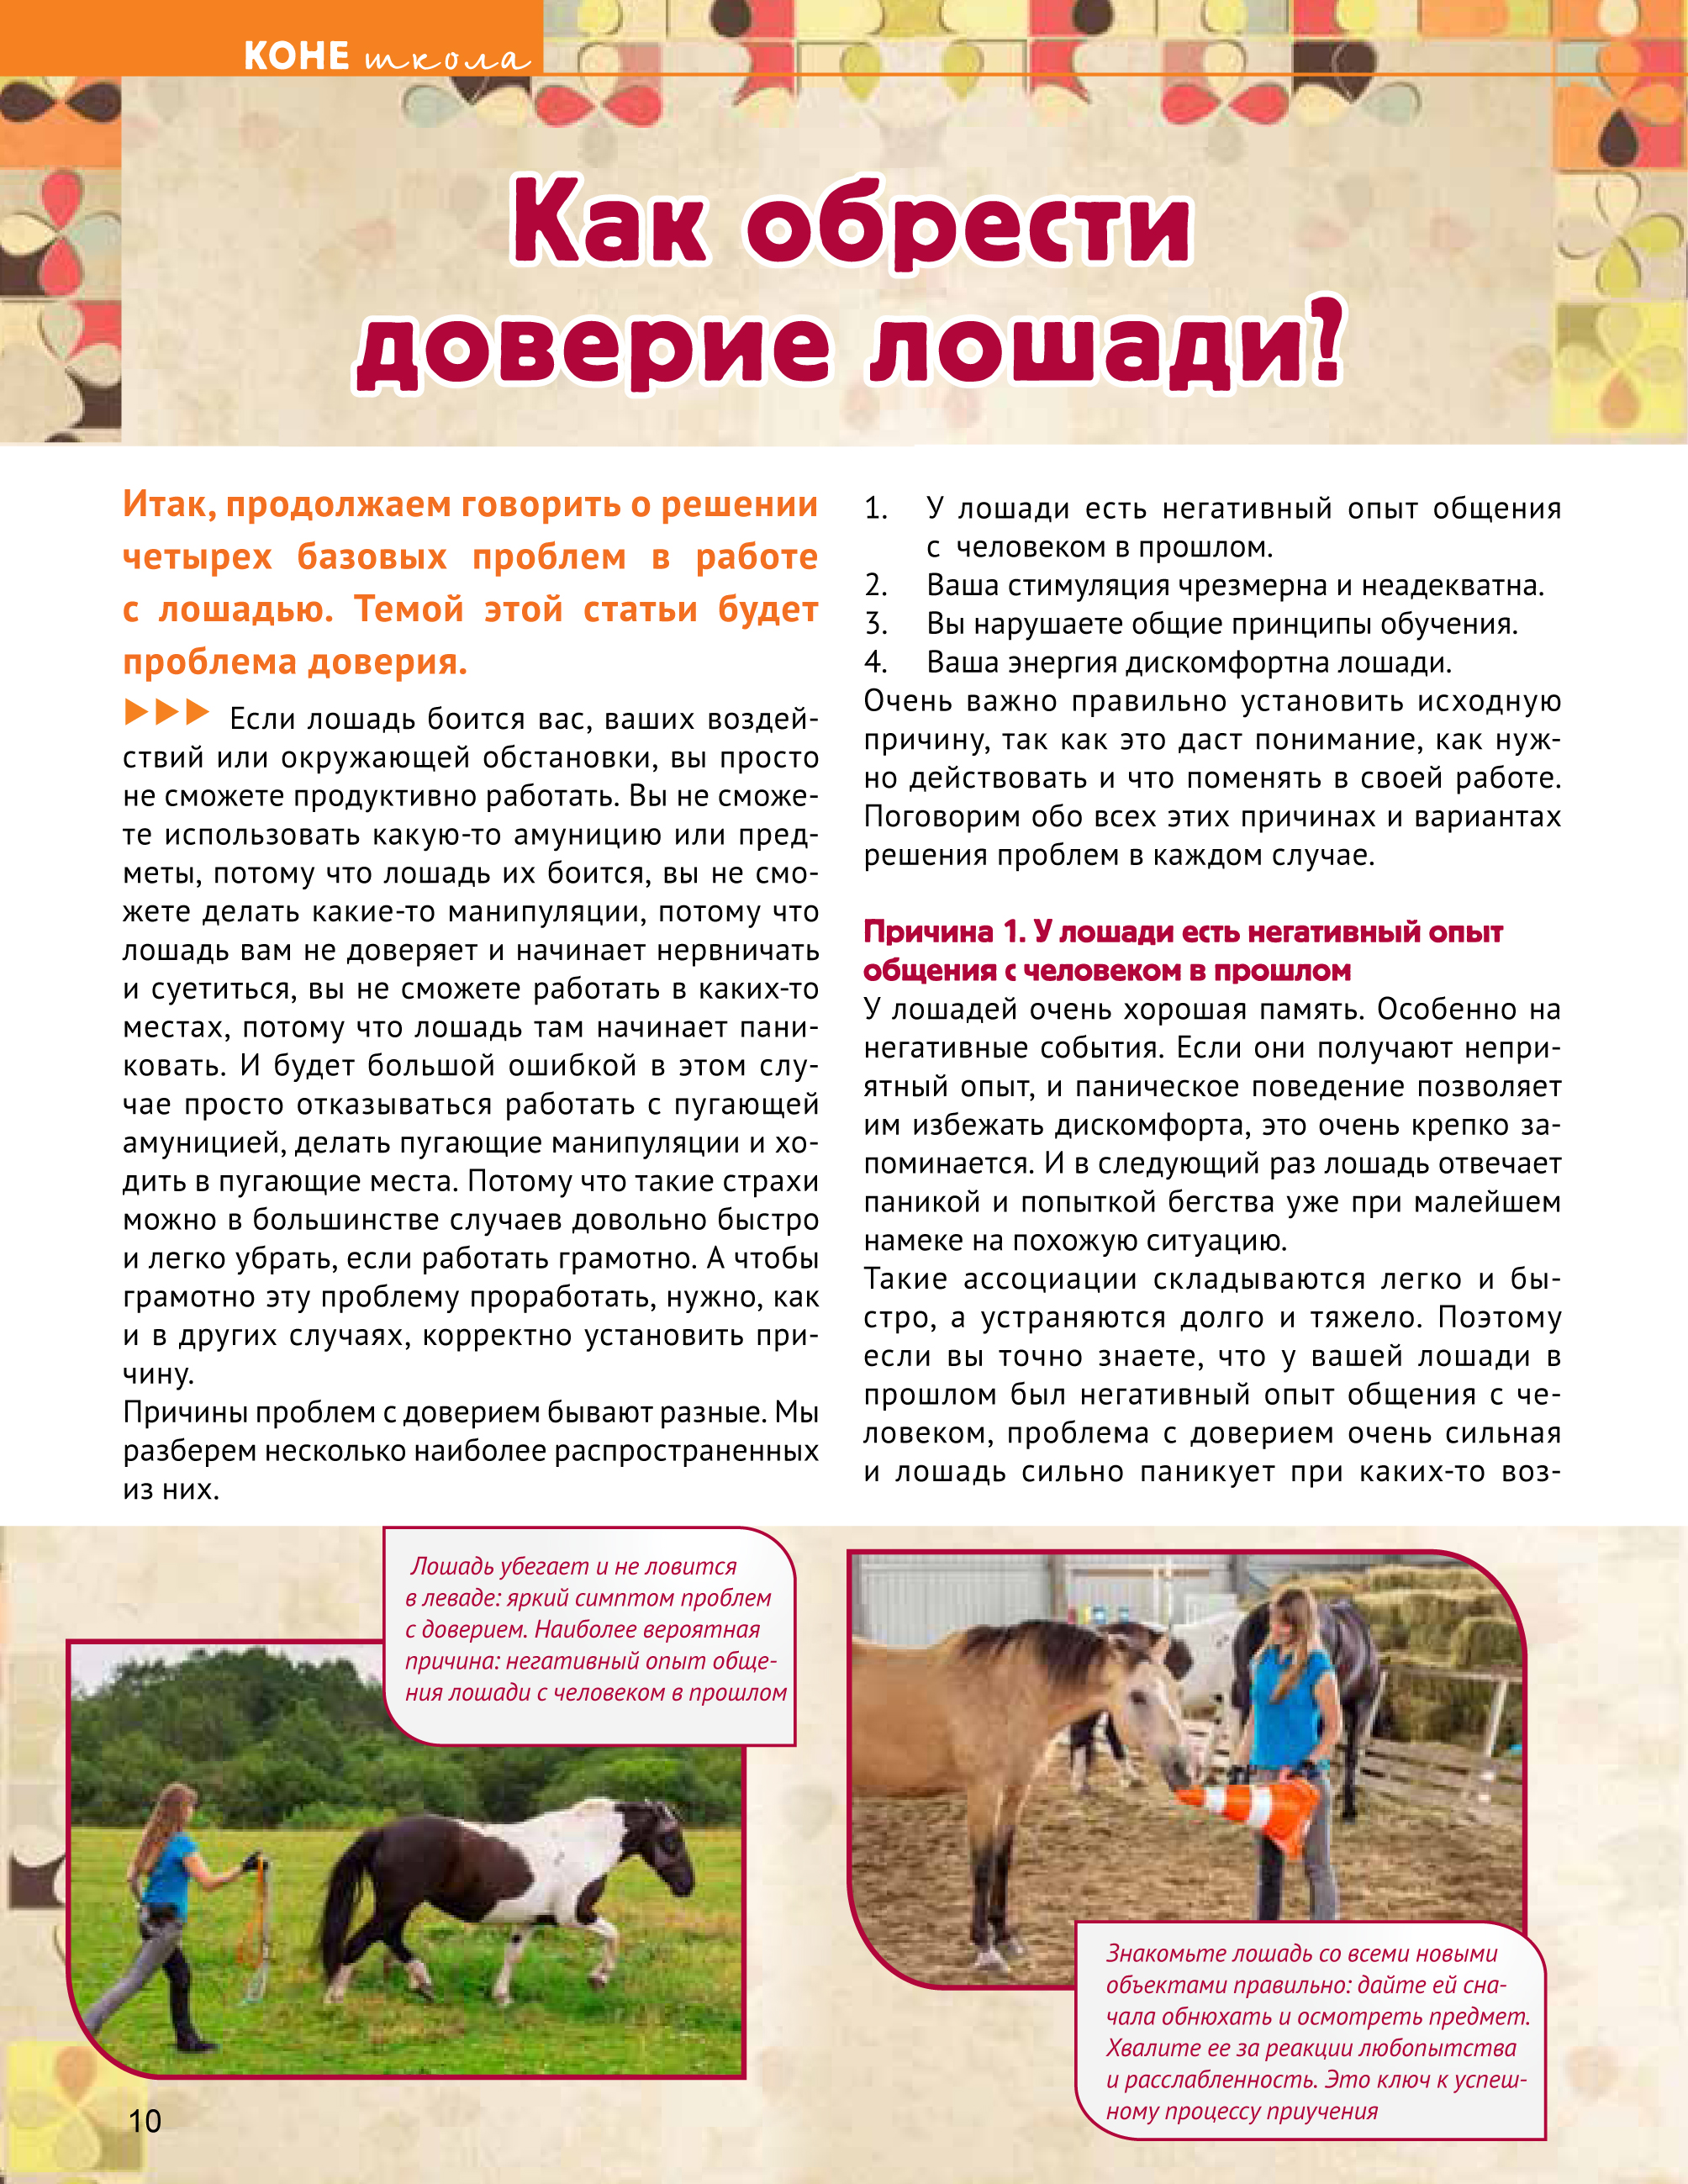 Book 5 2018 ДЛЯ САЙТА-10